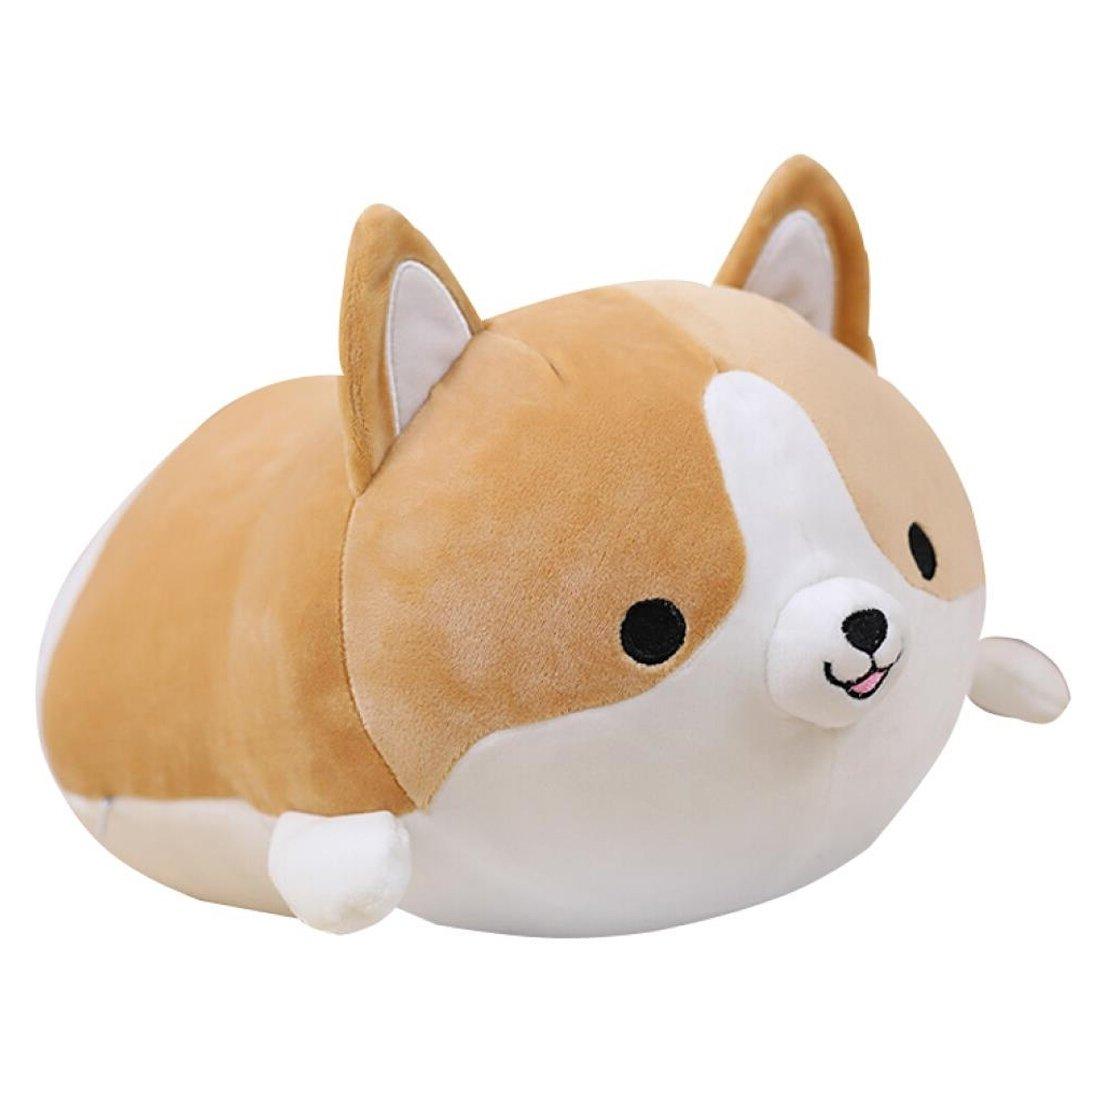 Levenkeness Corgi Dog Plush Pillow, Soft Cute Shiba Inu Akita Stuffed Animals Toy Gifts (brown, 17.7 in) by Levenkeness